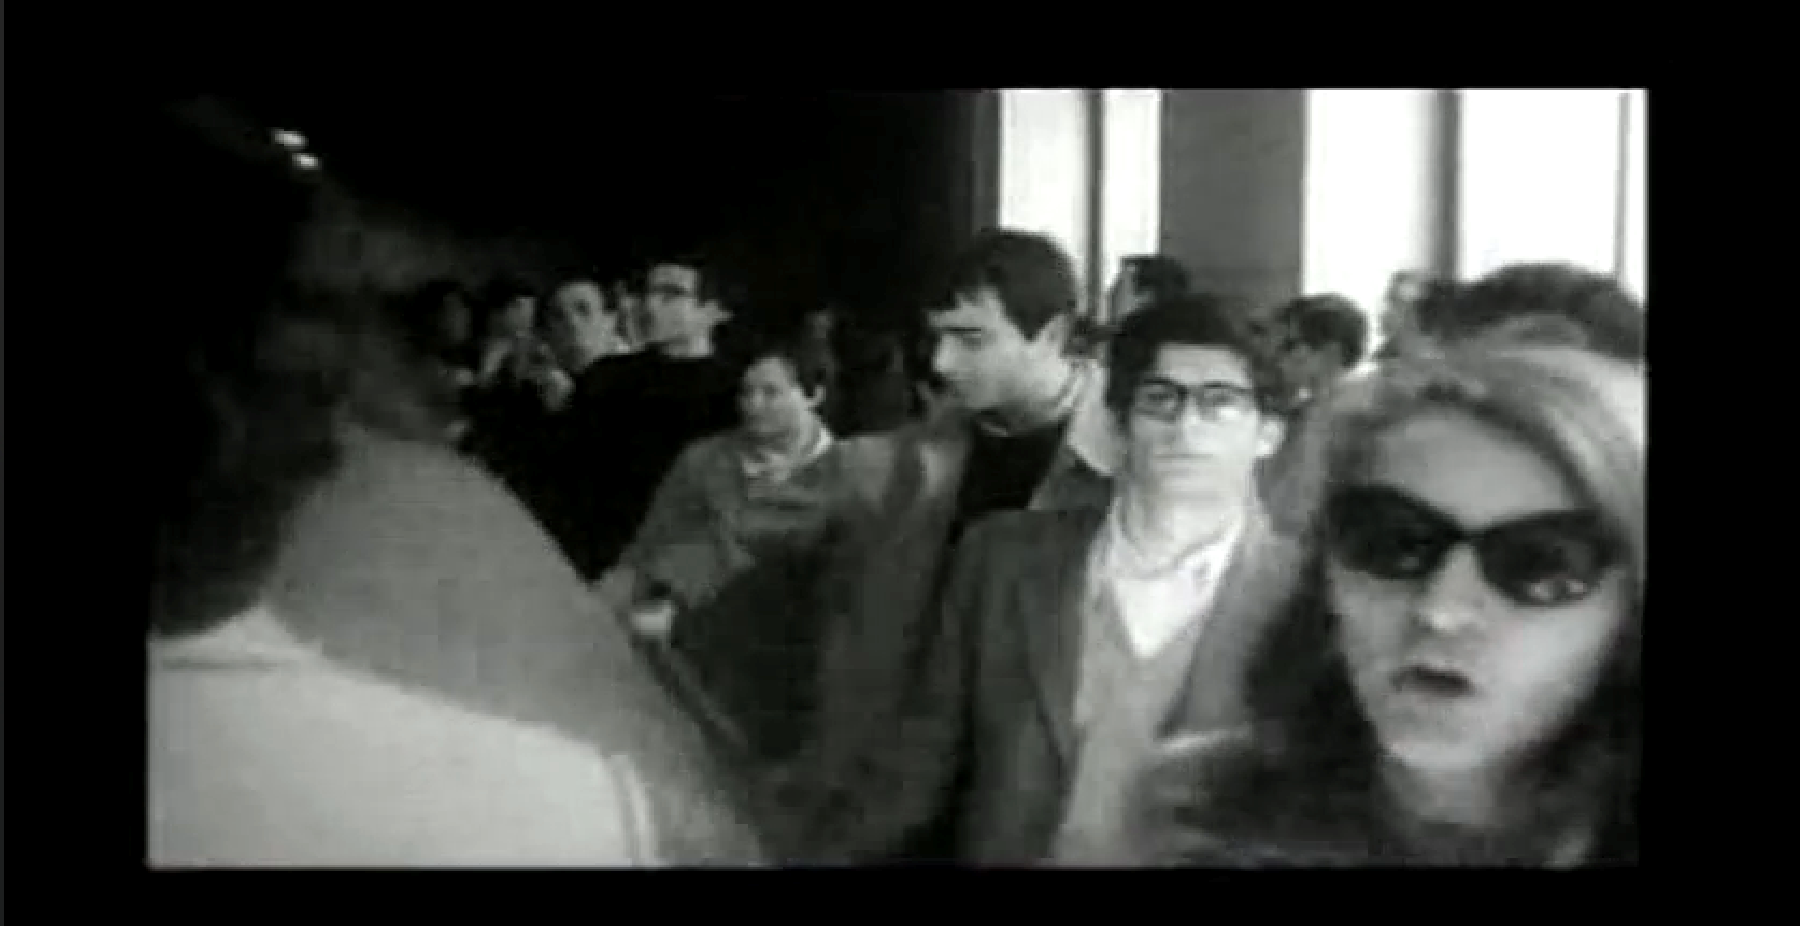 1967, revolt in the catholic university of Milan